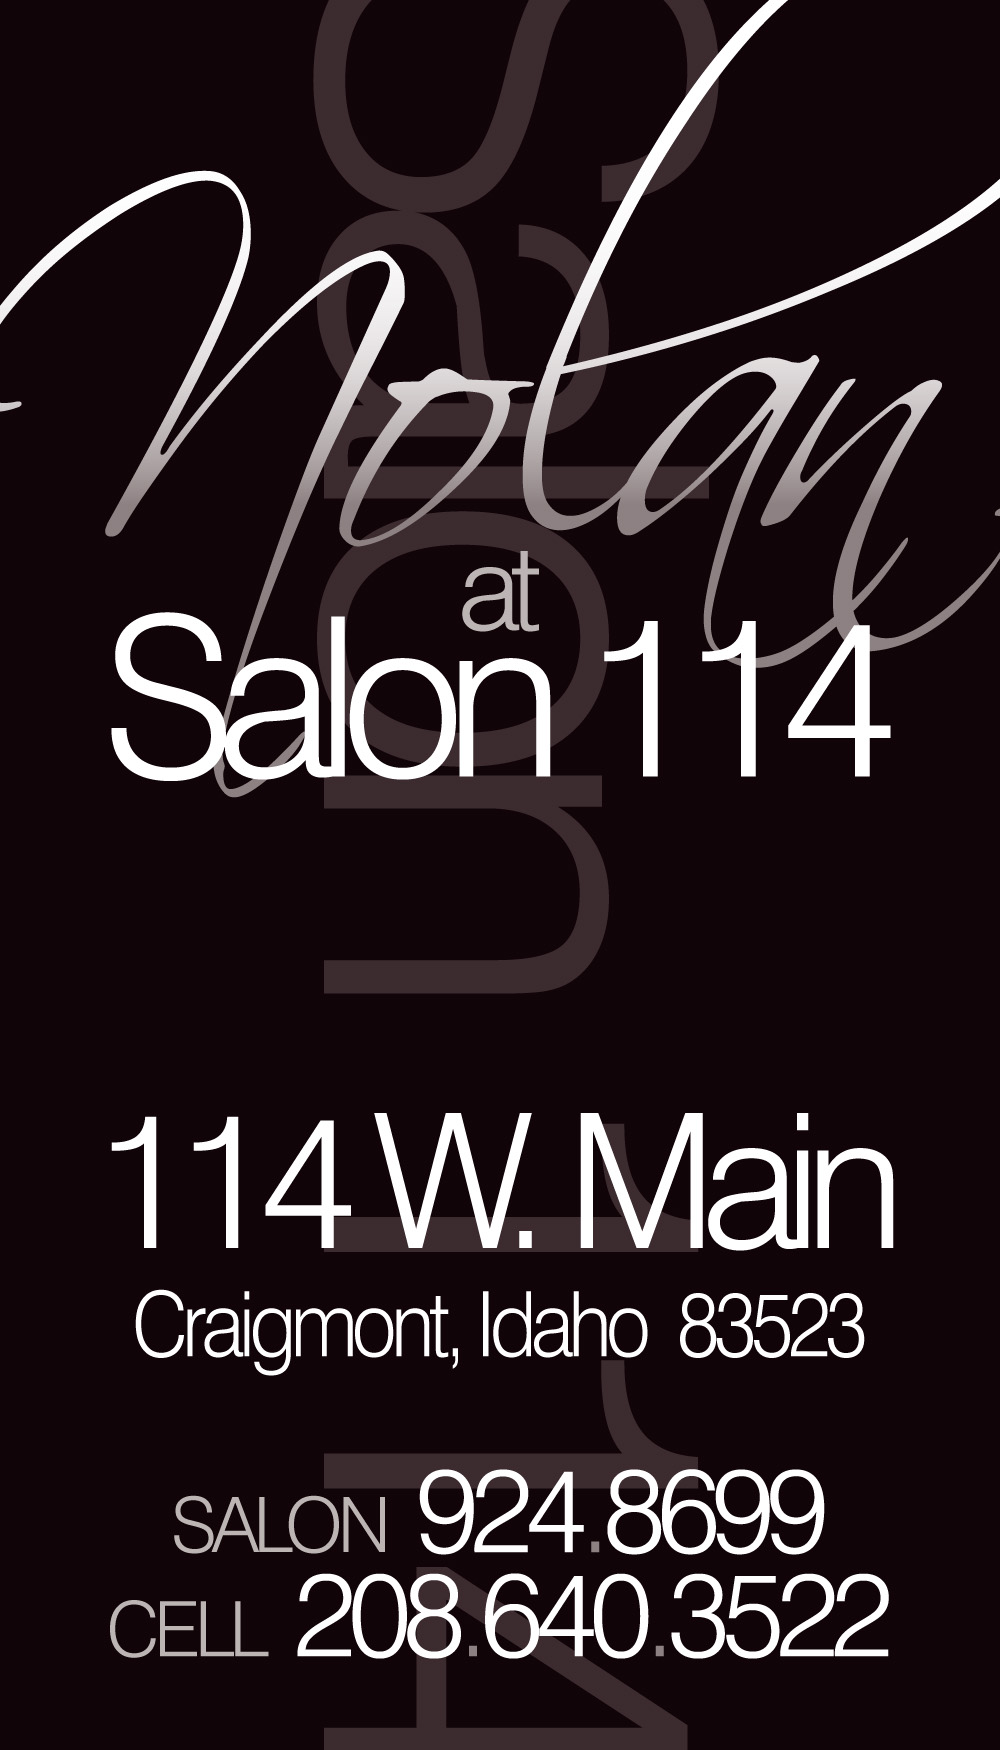 33384_Salon114_BC-Nolan_Front.jpg